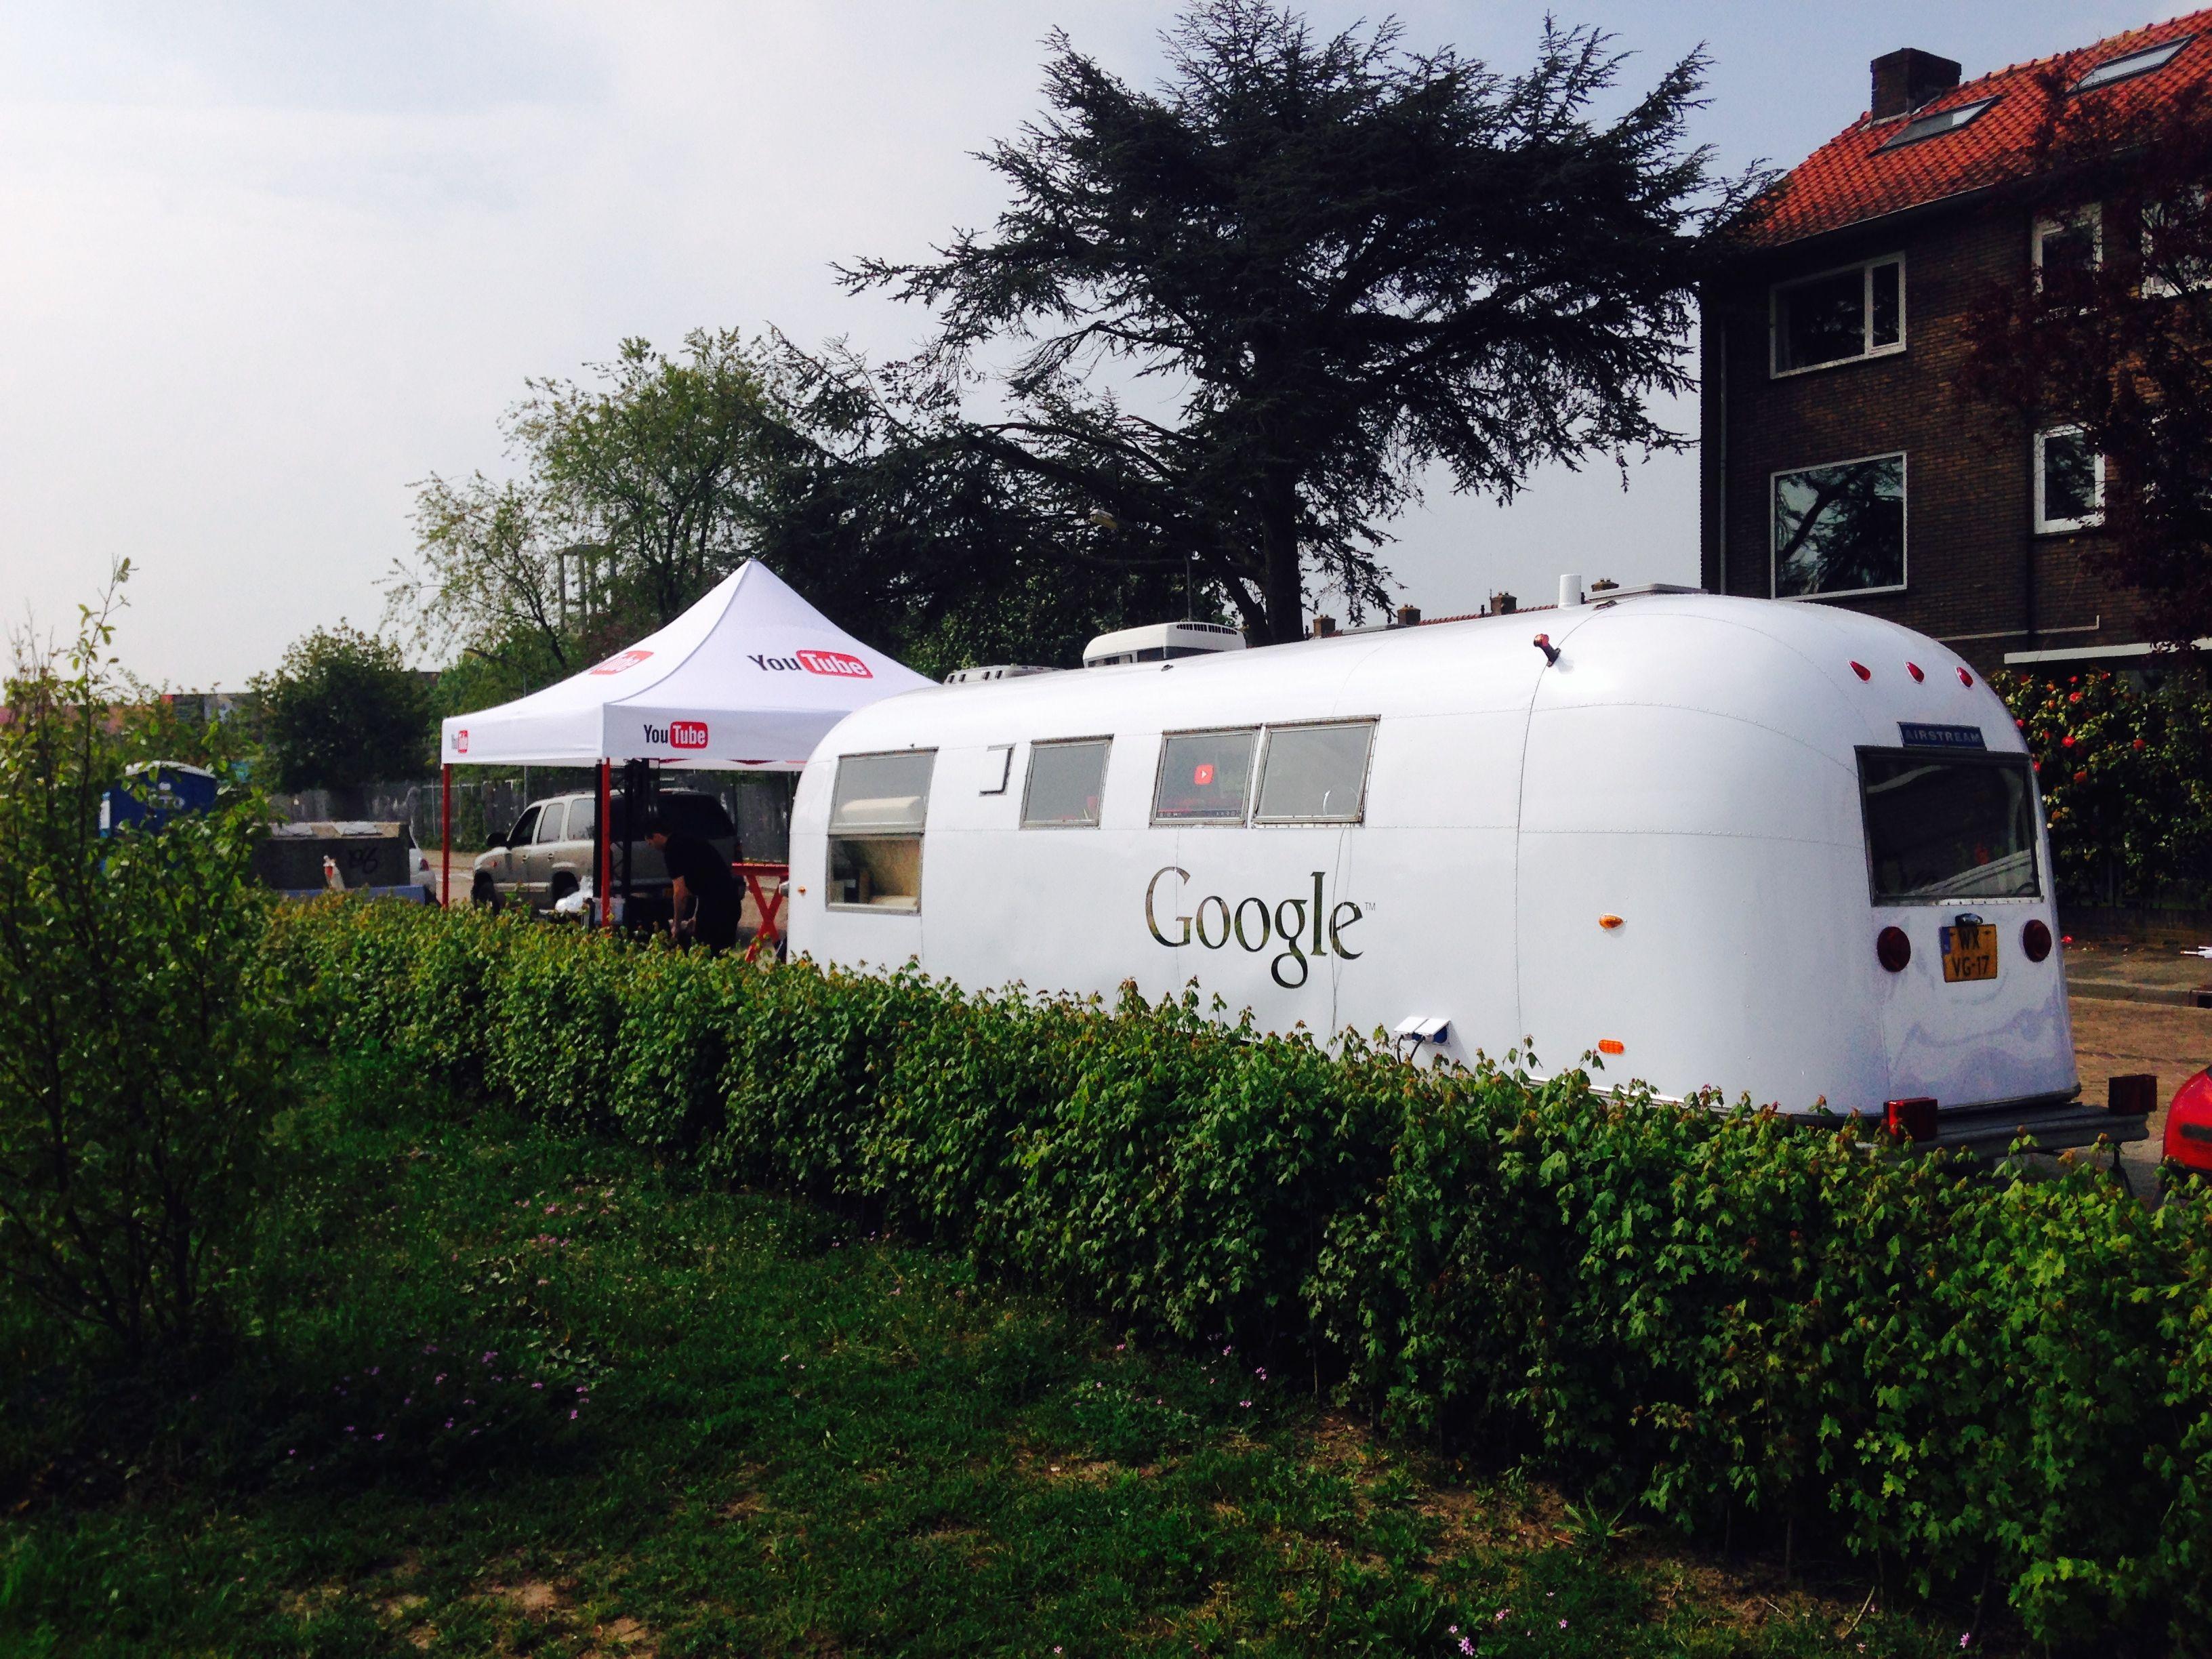 GoogleStream Caravan